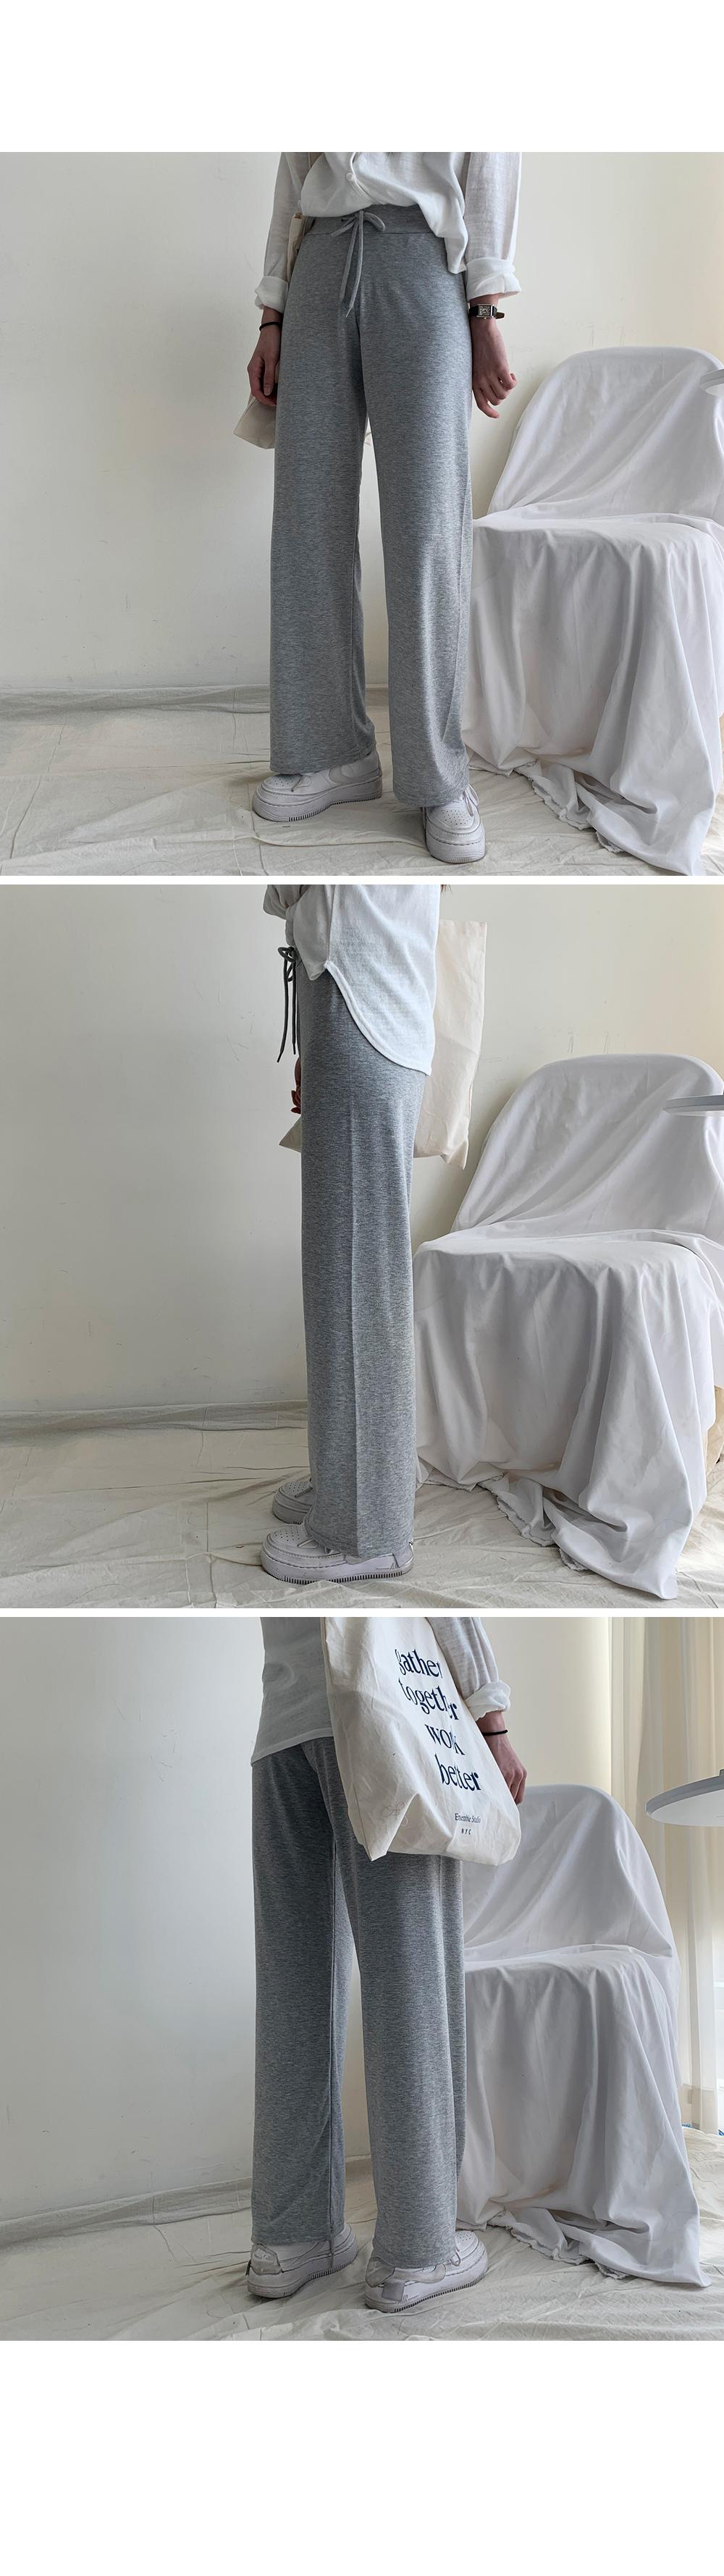 Kend training long pants